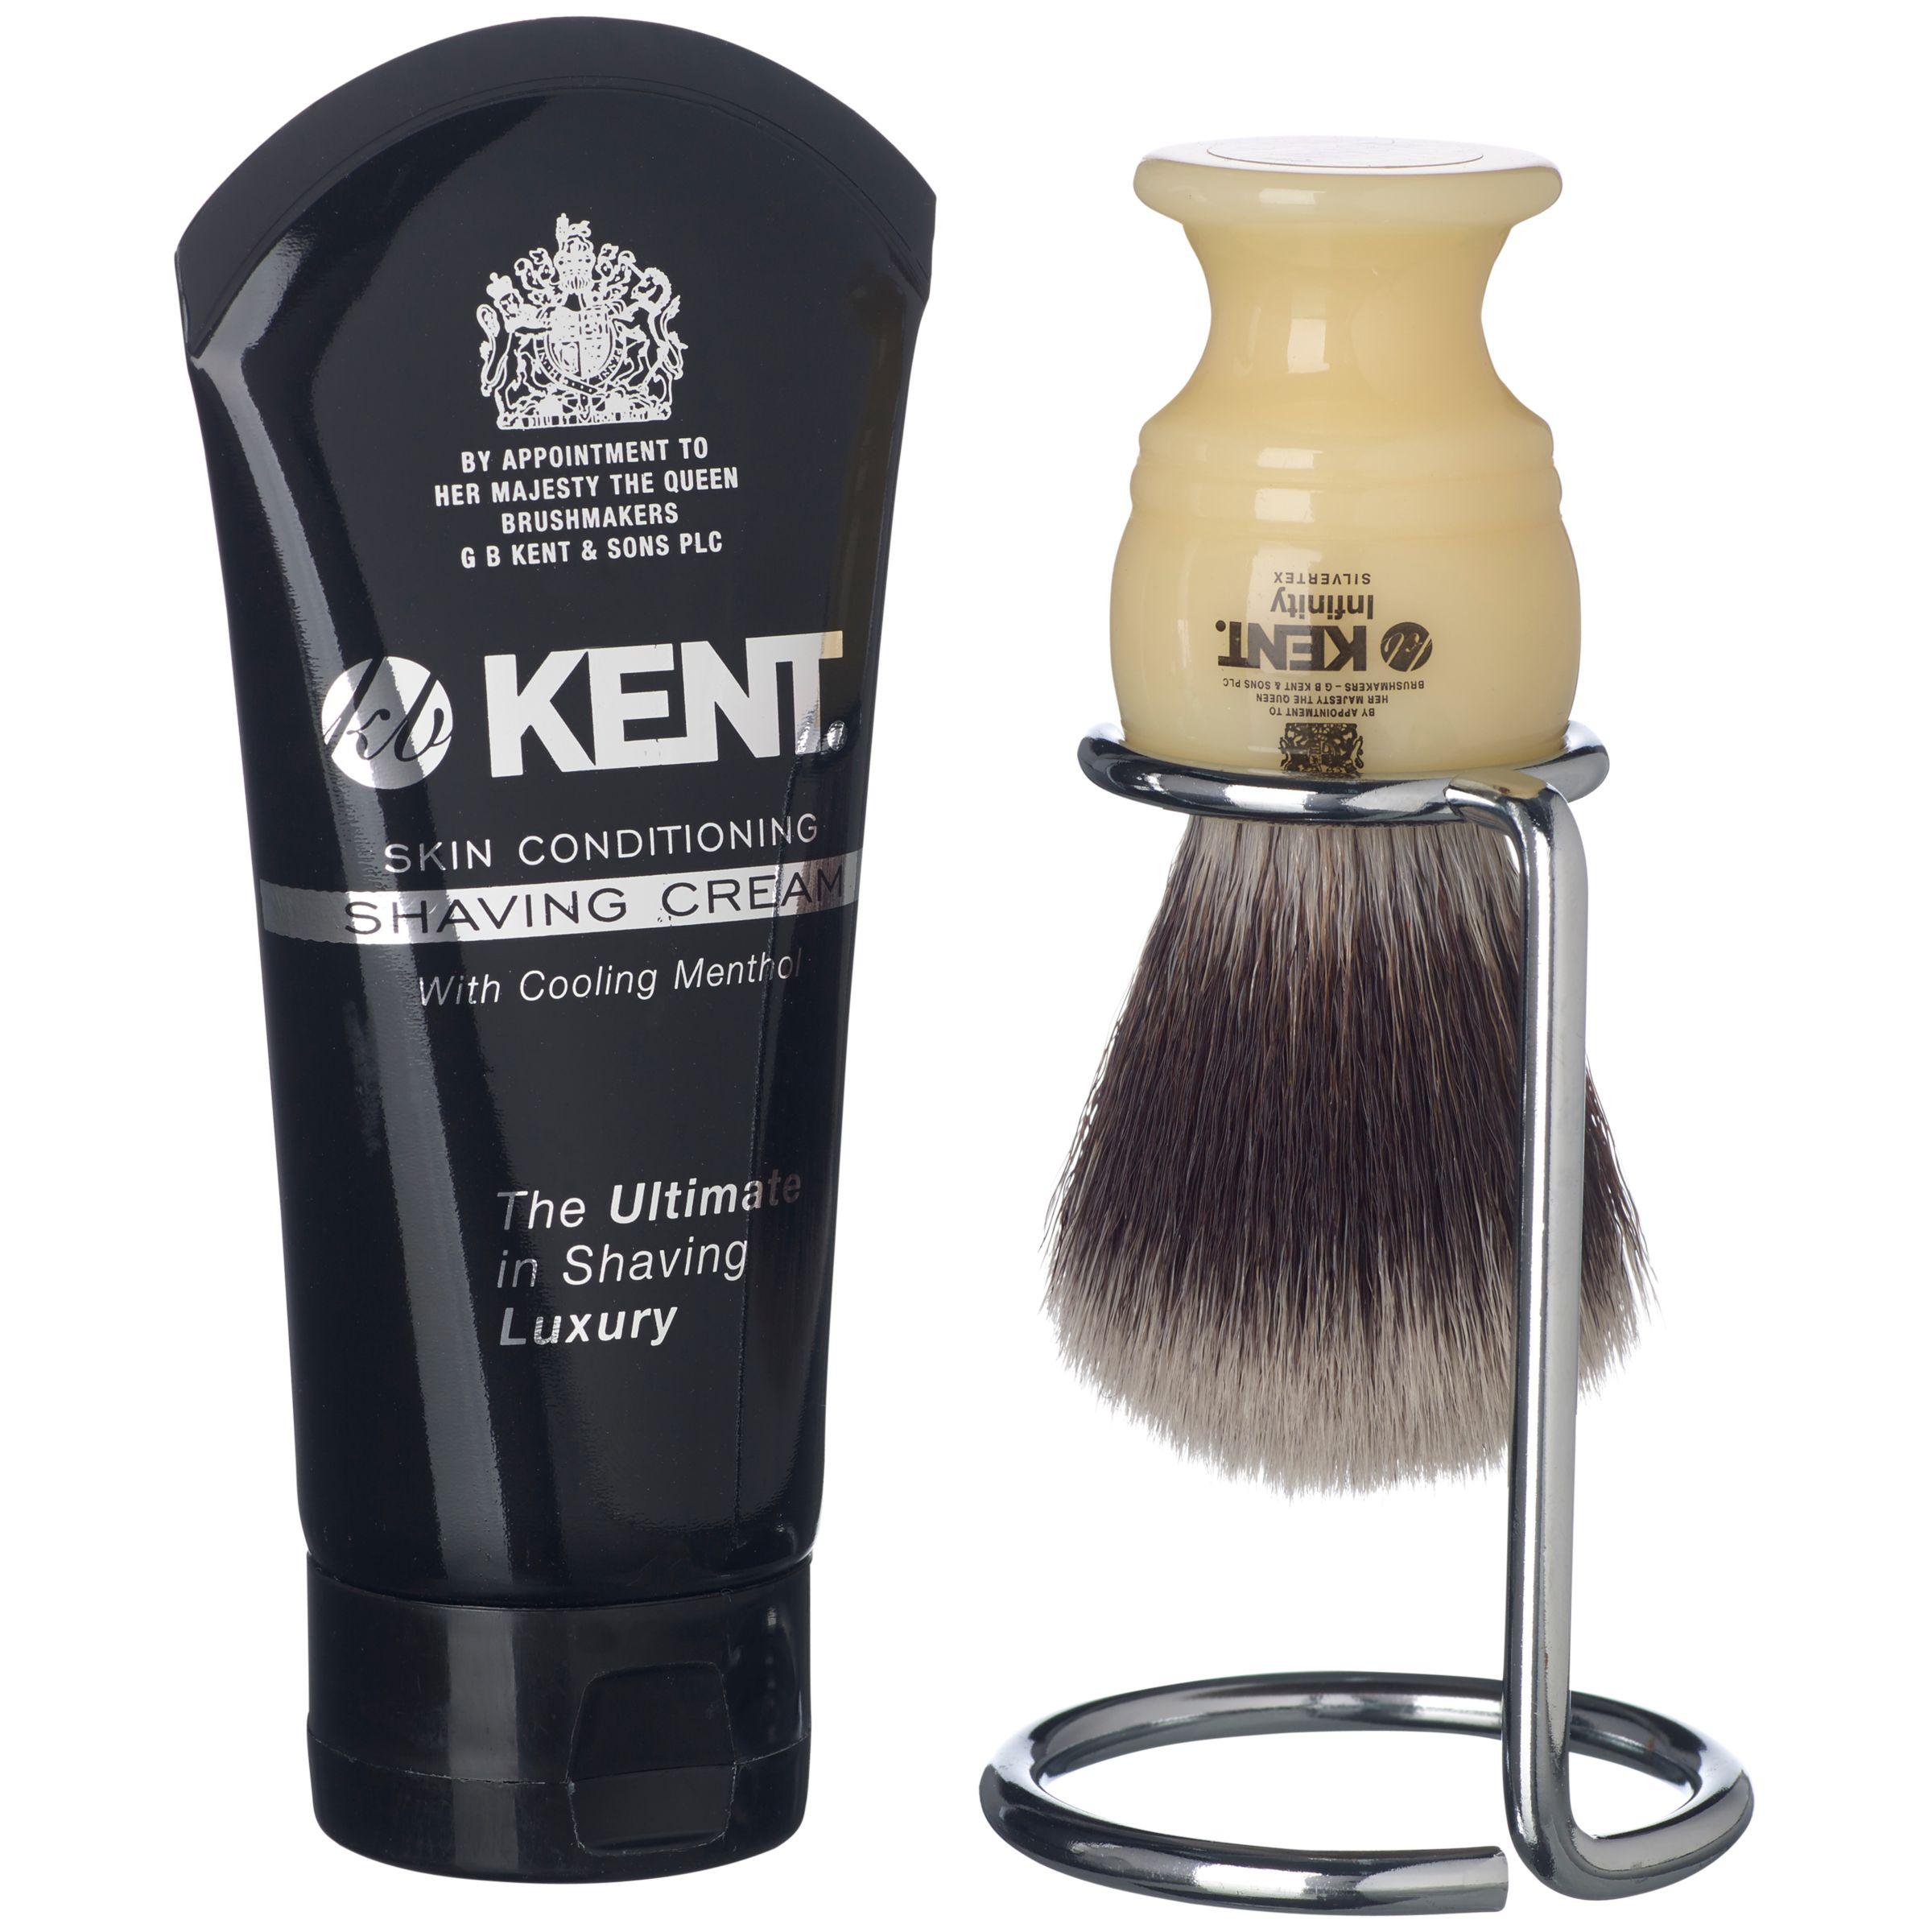 Kent Kent & Sons Shaving Gift Set